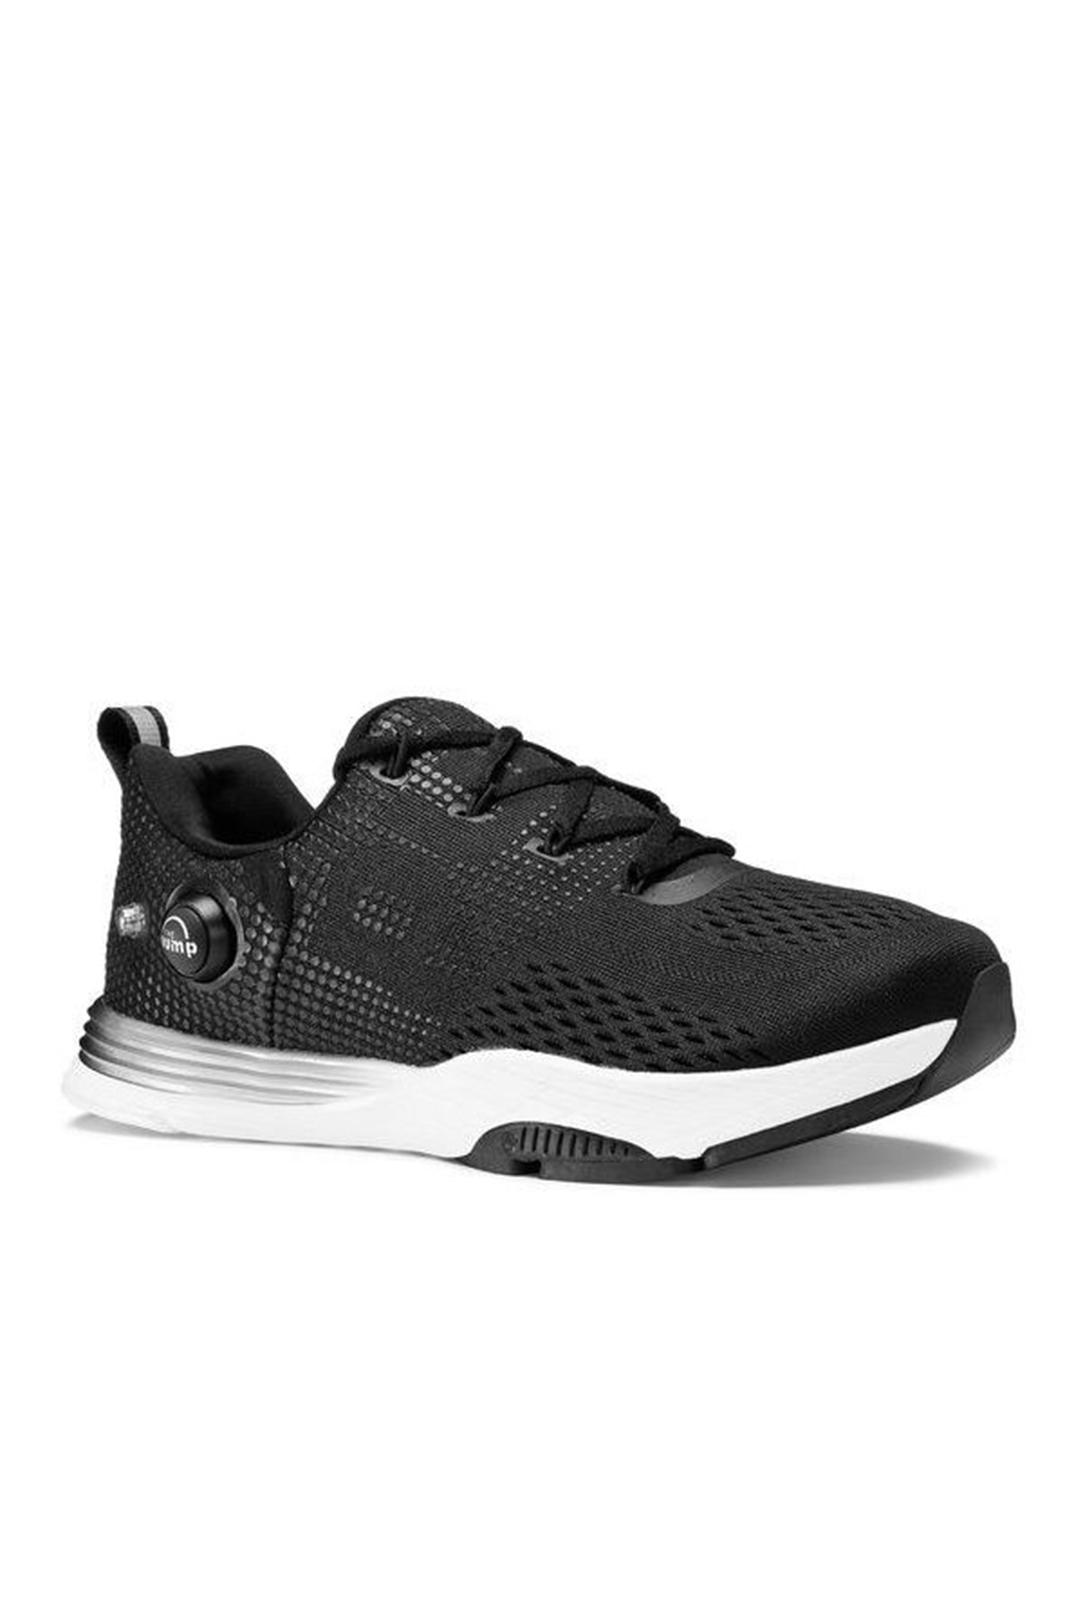 Baskets / Sneakers  Reebok V66014 CARDIO PUMP FUSION NOIR